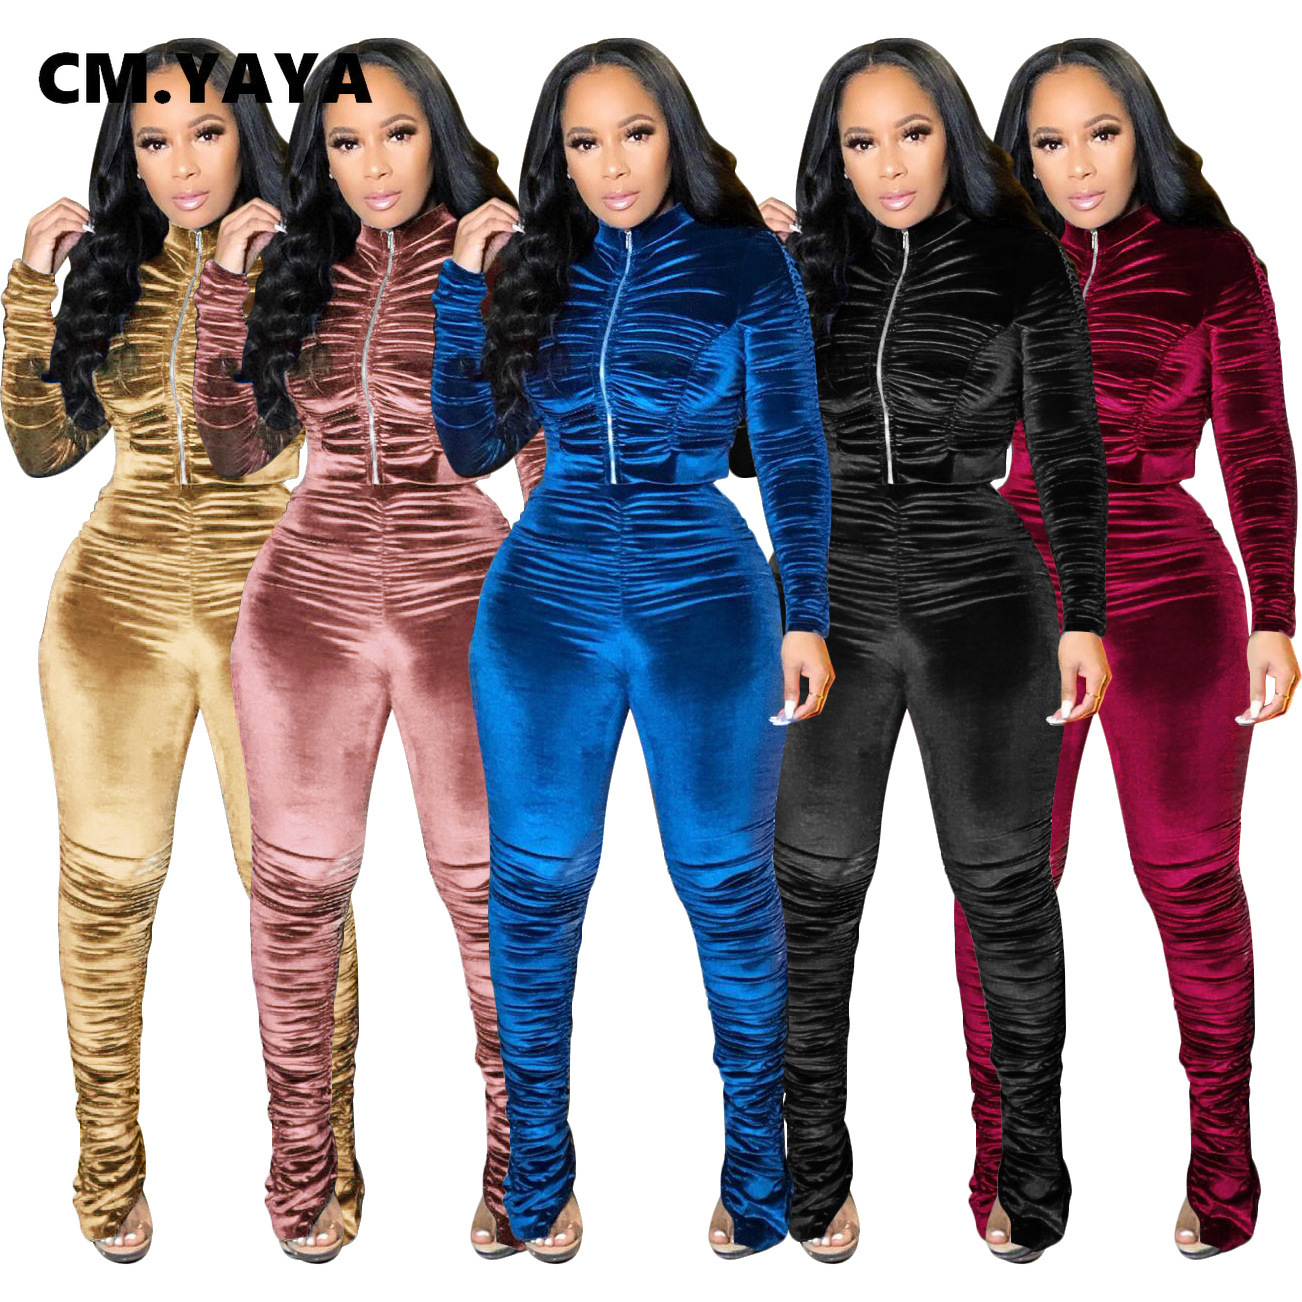 CM.YAYA Aktive Samt Gestapelt Sweatsuit frauen Set Zipper Jacke Hosen Anzug Streetwear Trainingsanzug Zwei Stück Set Fitness Outfit